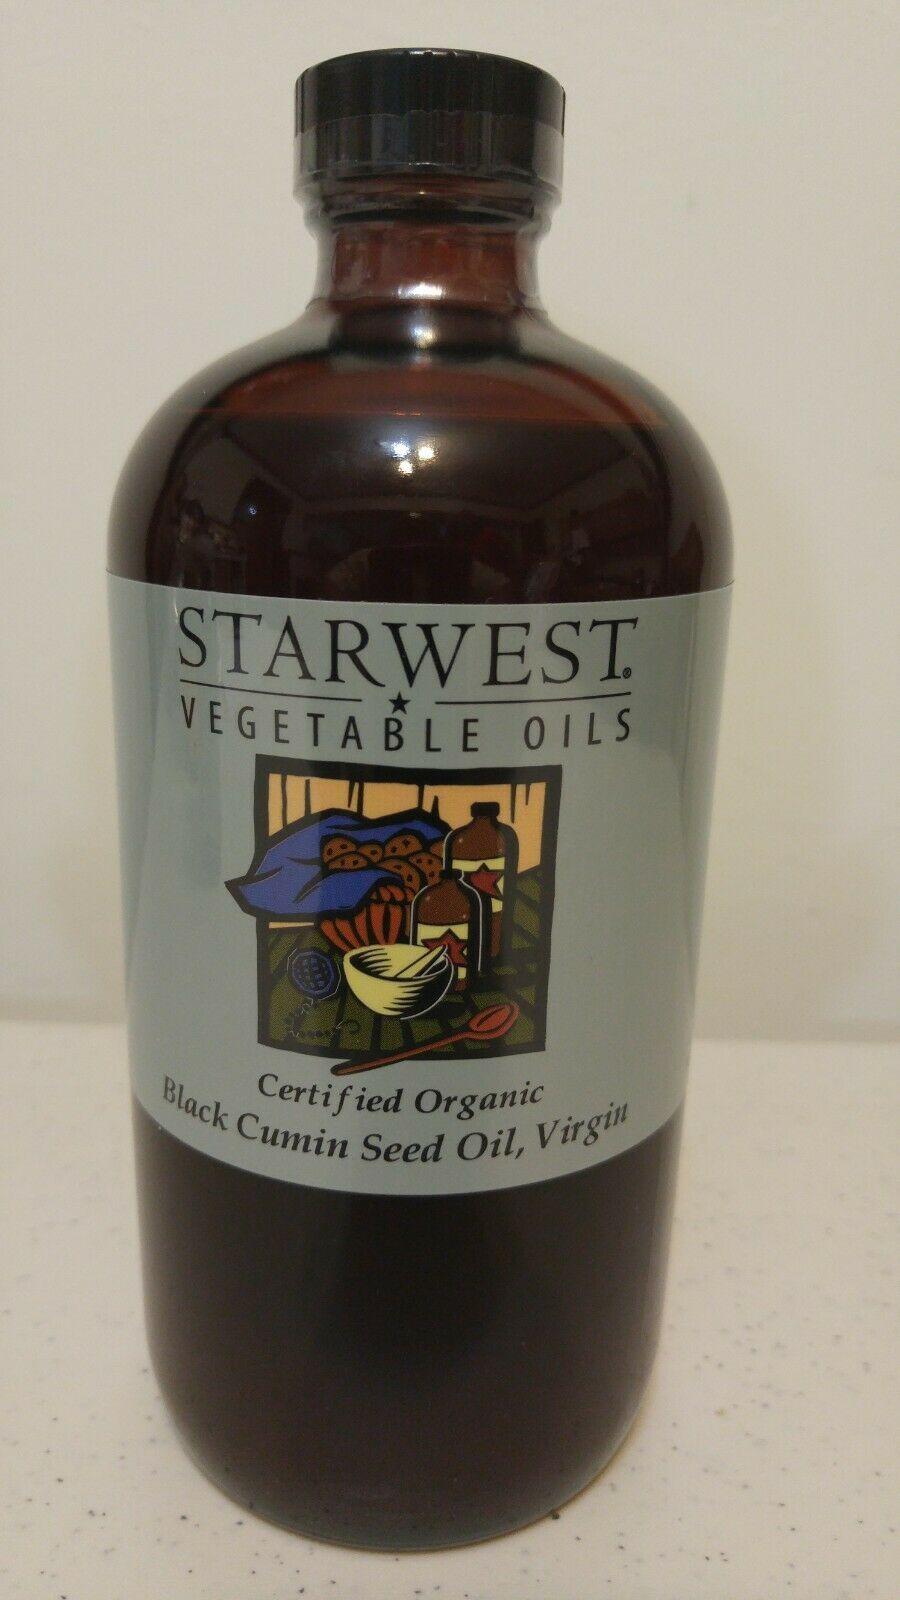 BLACK CUMIN SEED OIL VIRGIN 16 OUNCE CERTIFIED ORGANIC STARWEST VEGETABLE OILS - $38.98